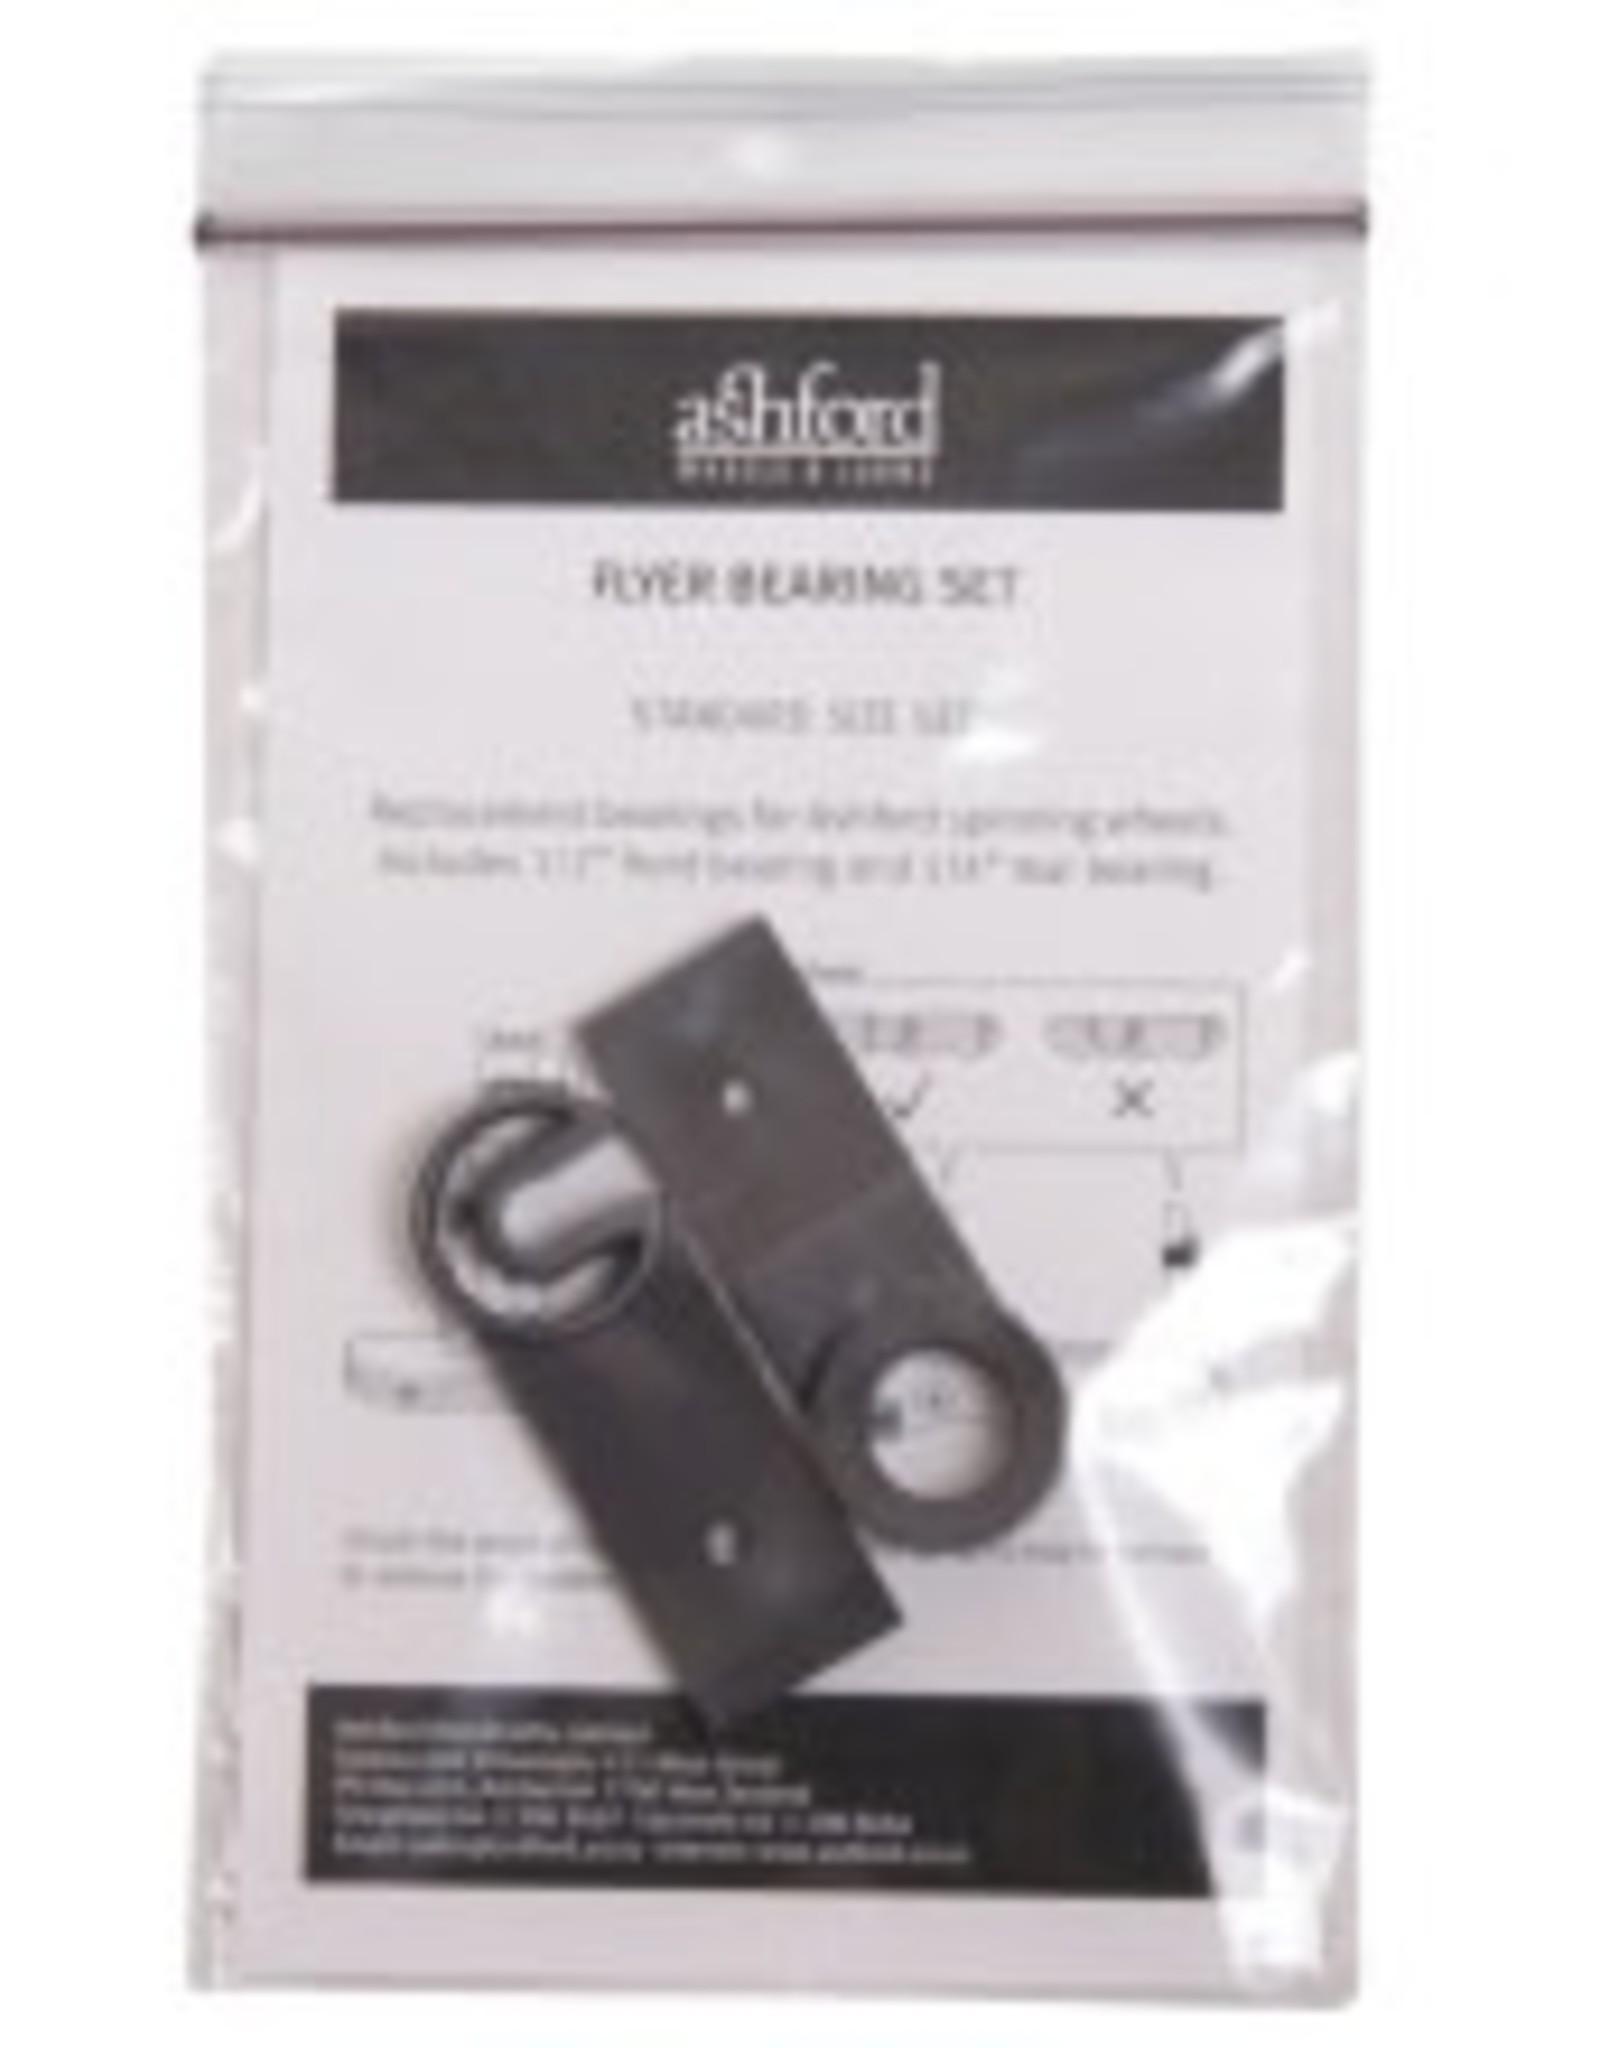 Ashford Ashford Flyer Bearing STd set